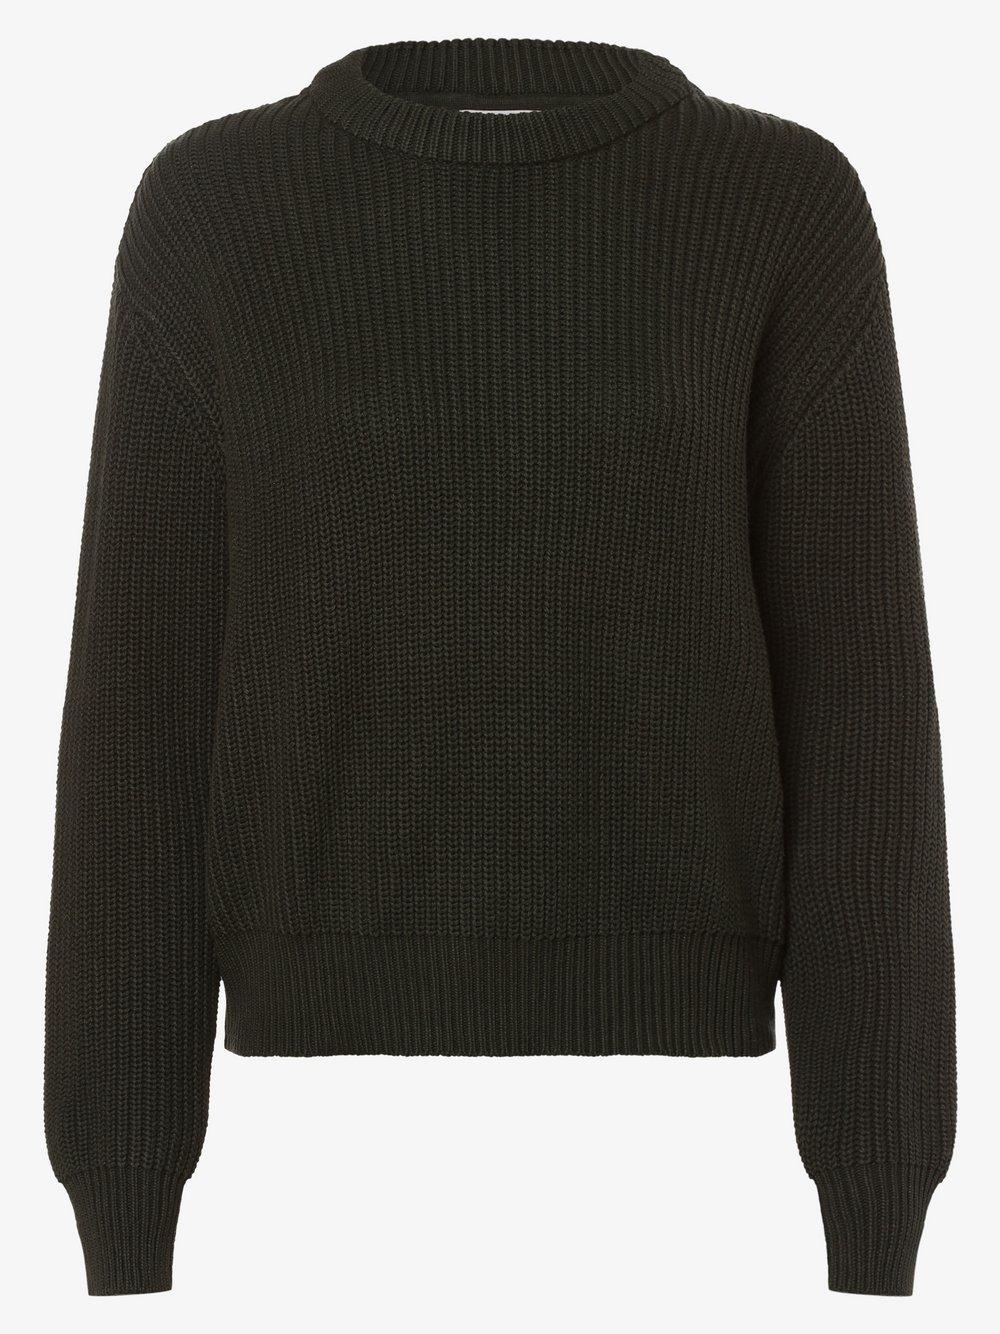 Minimum – Sweter damski – Mikala, zielony Van Graaf 405237-0003-09940